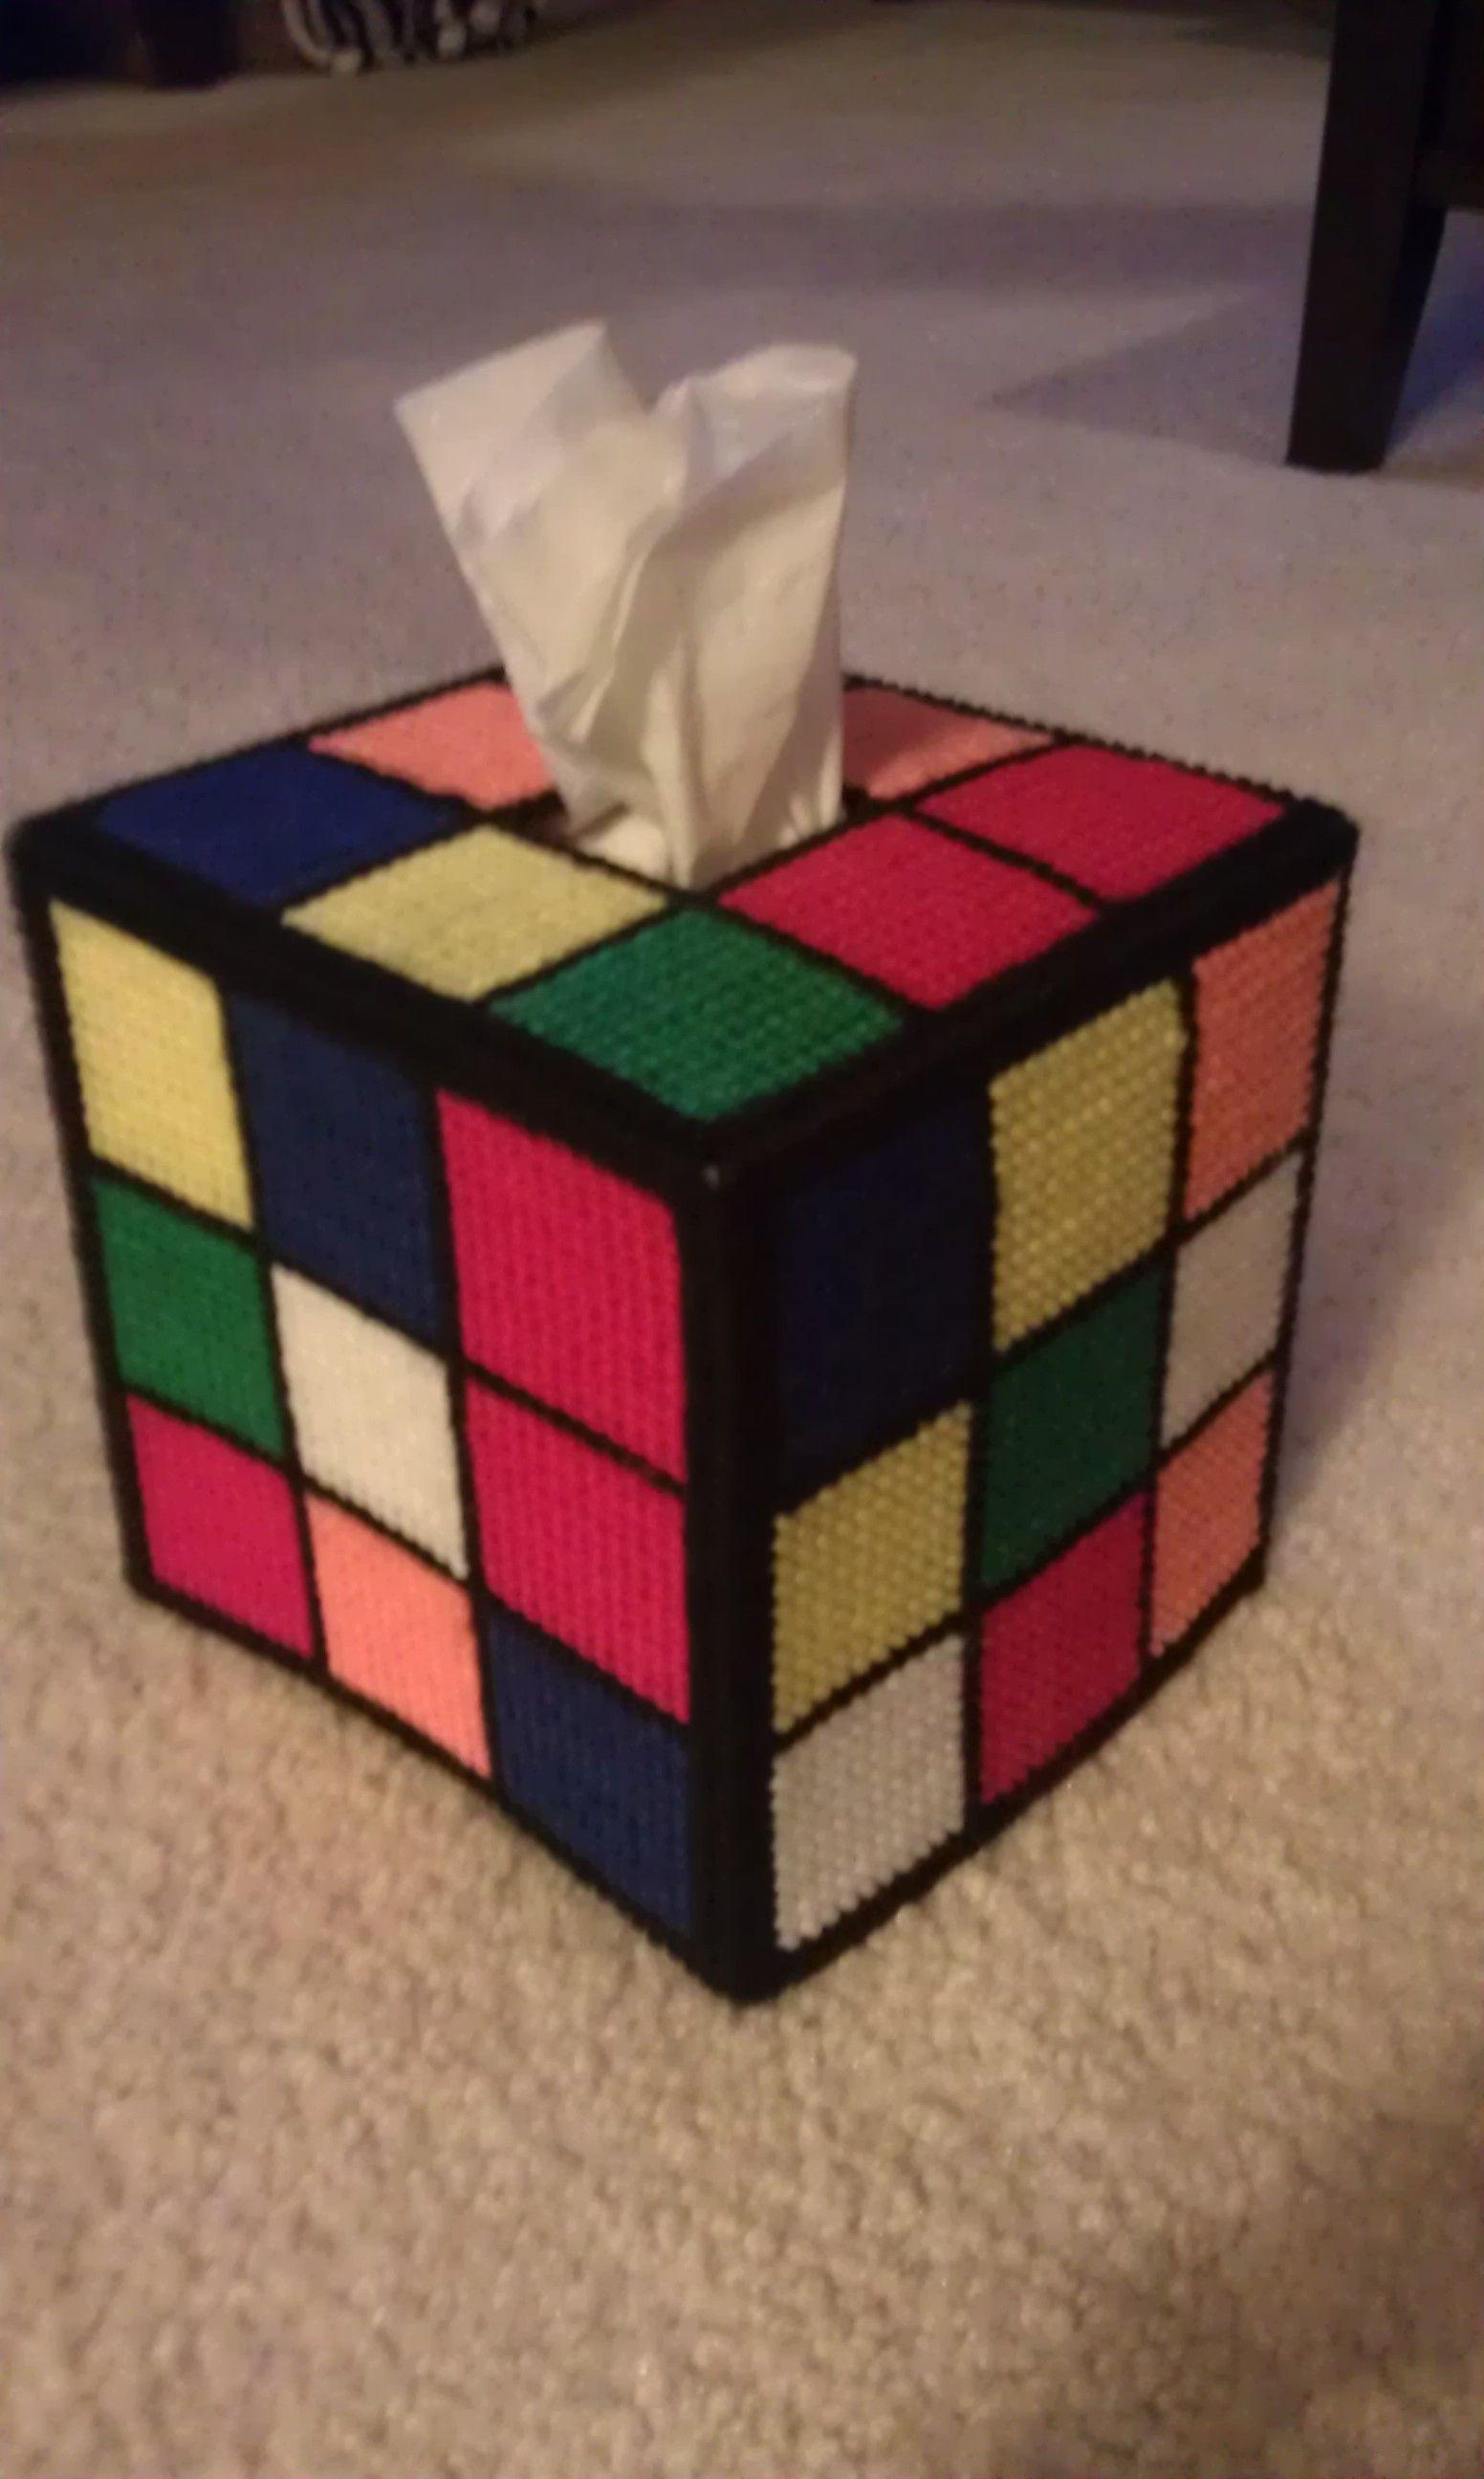 Homemade tissue box cover crafts diy pinterest for Tissue box cover craft